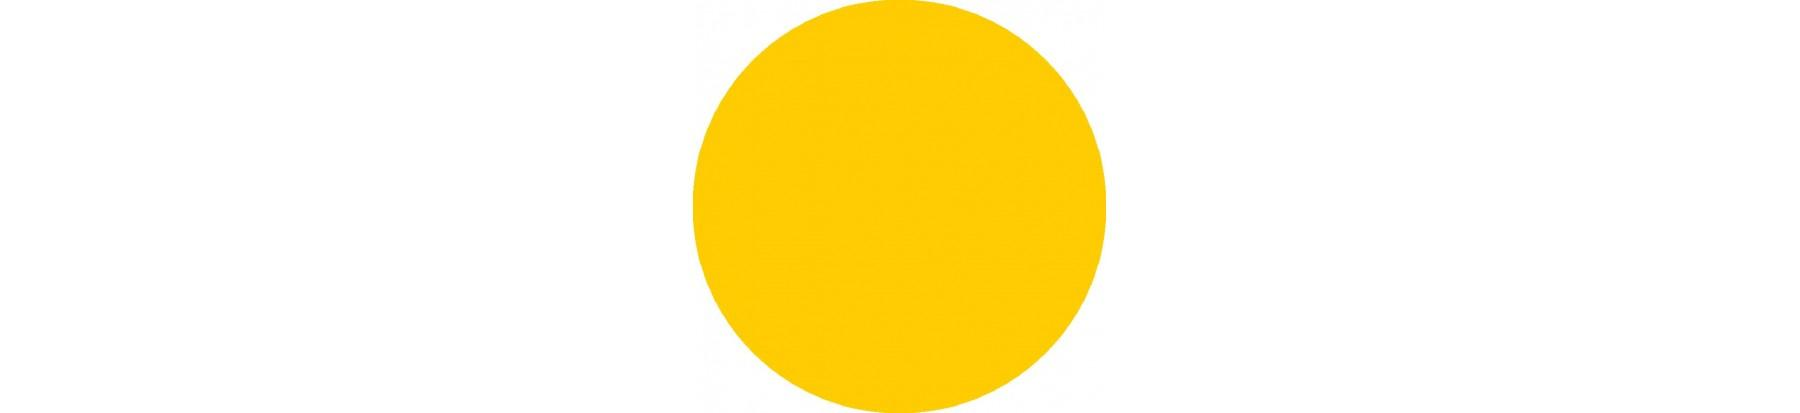 Желтые золотые тени